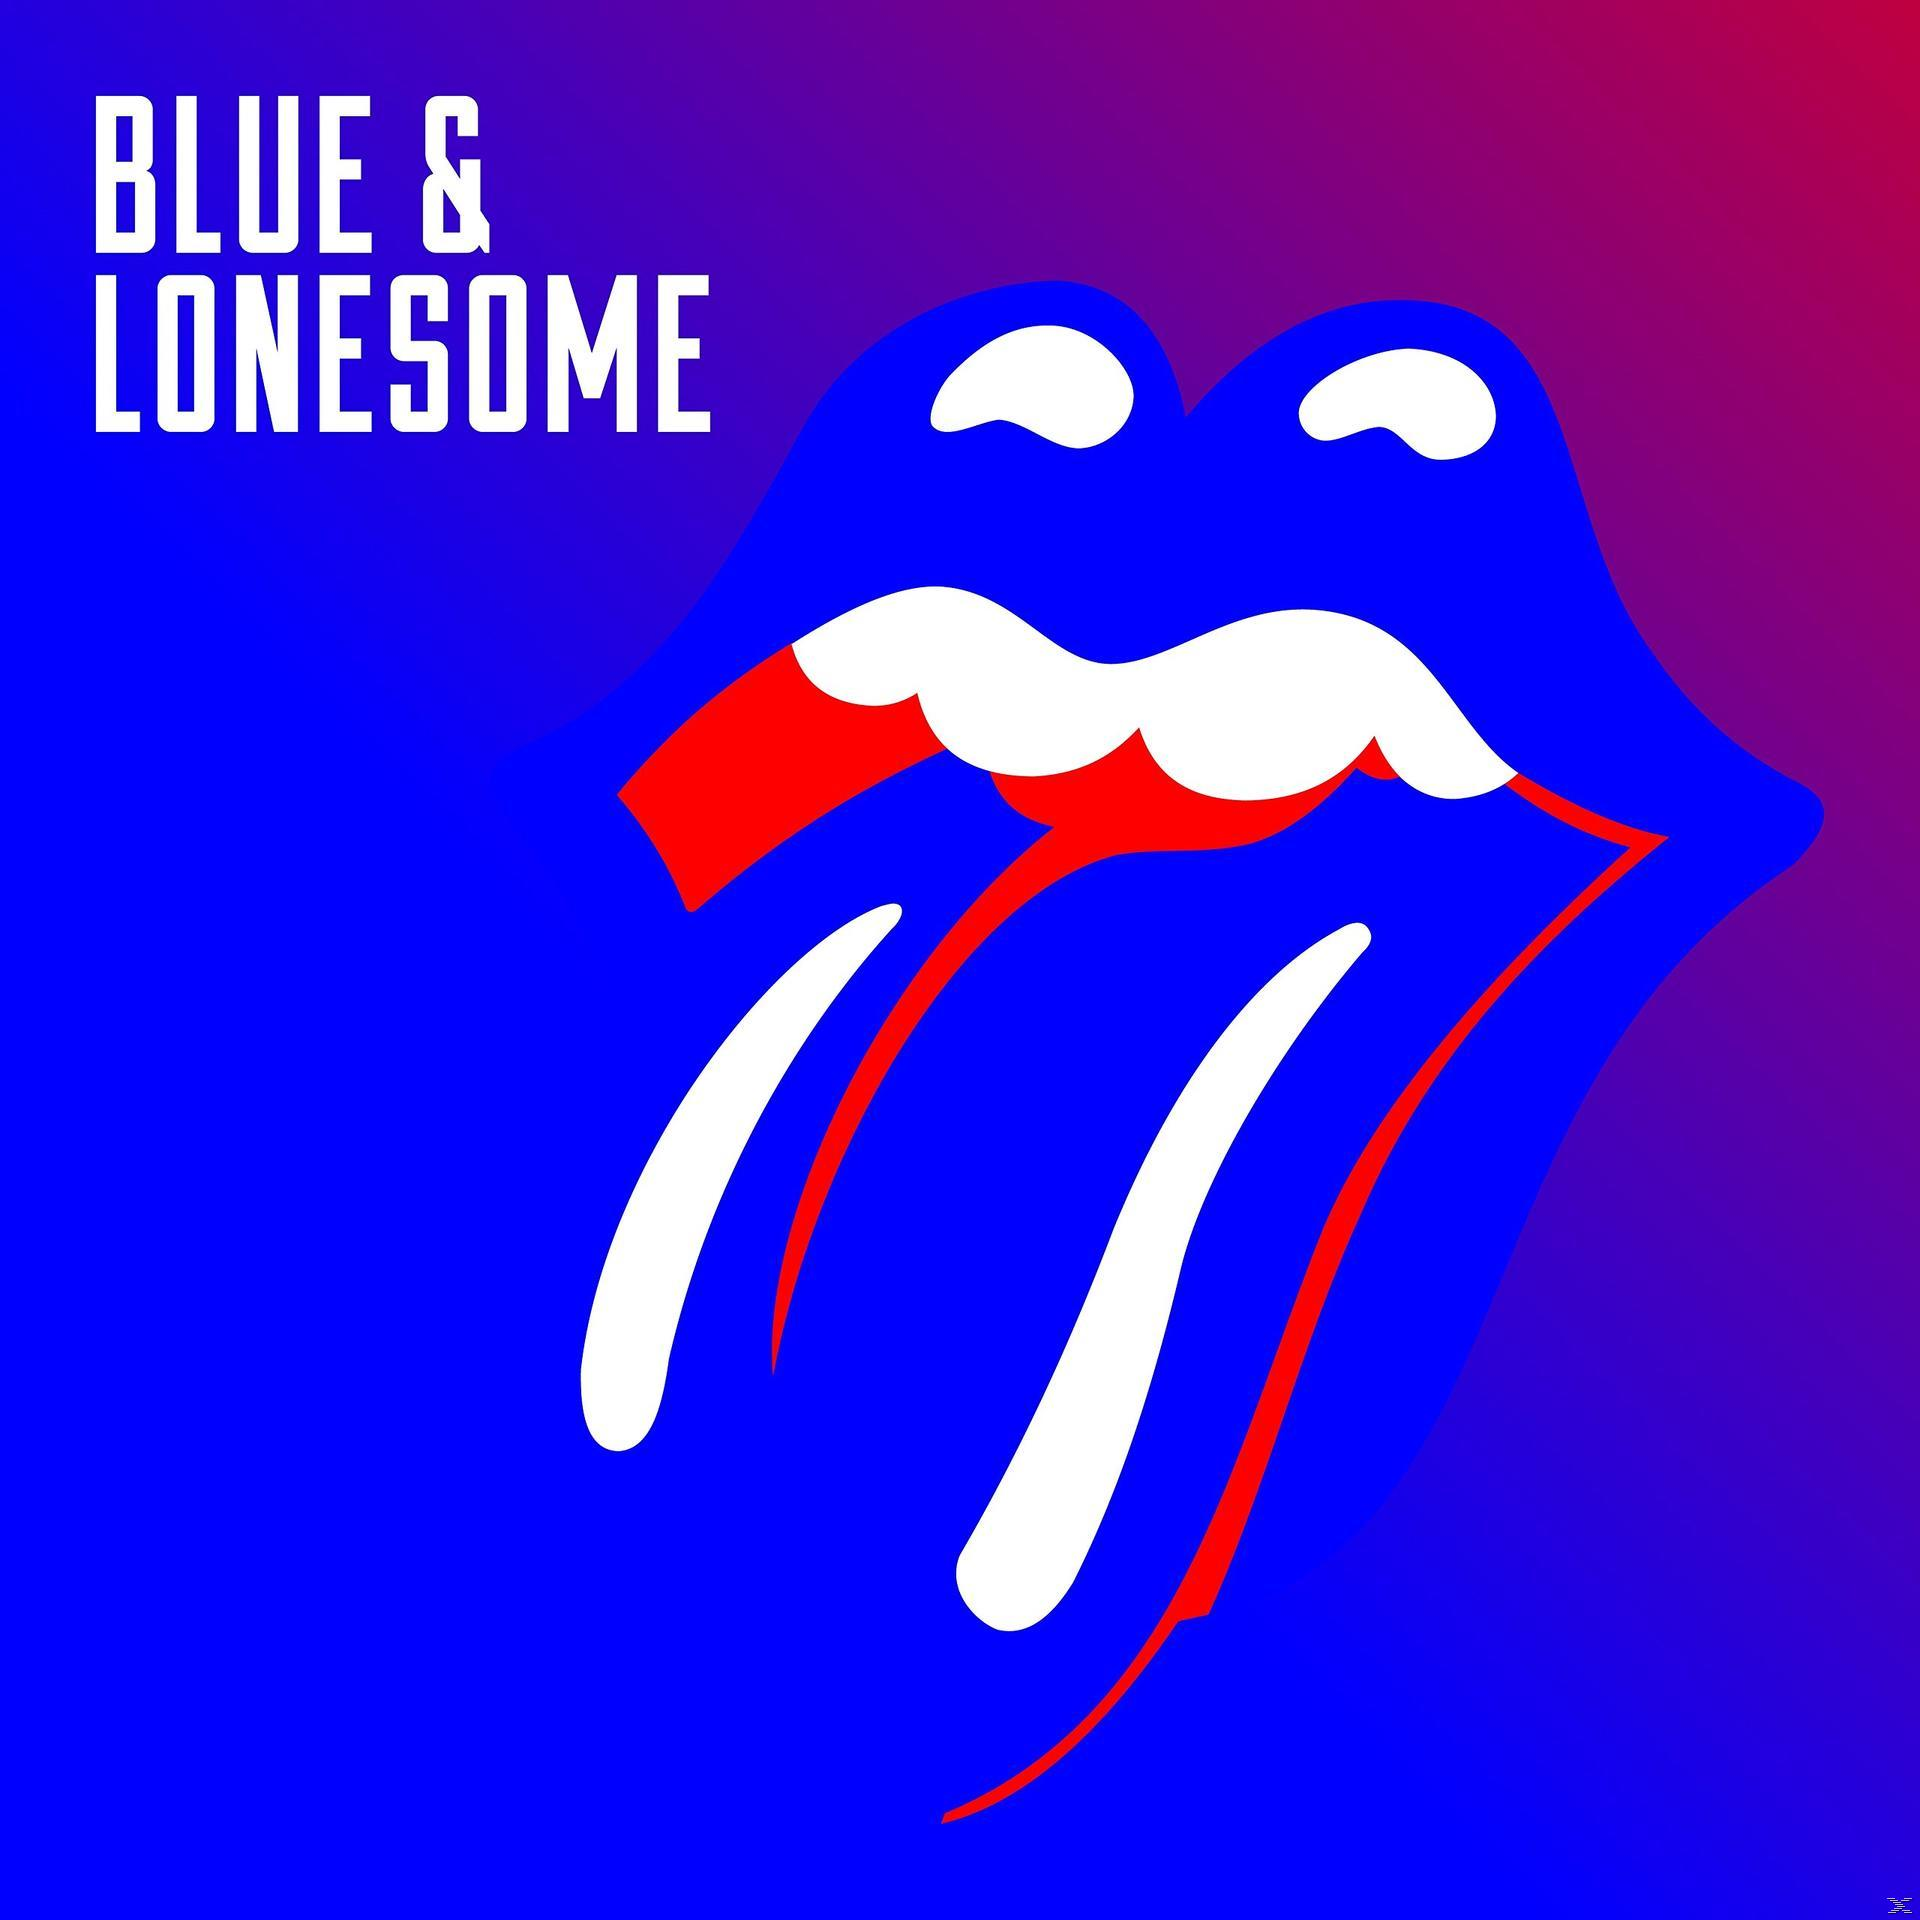 Rolling Stones Blue & Lonesome. Οι γερόλυκοι του ροκ επιστρέφουν